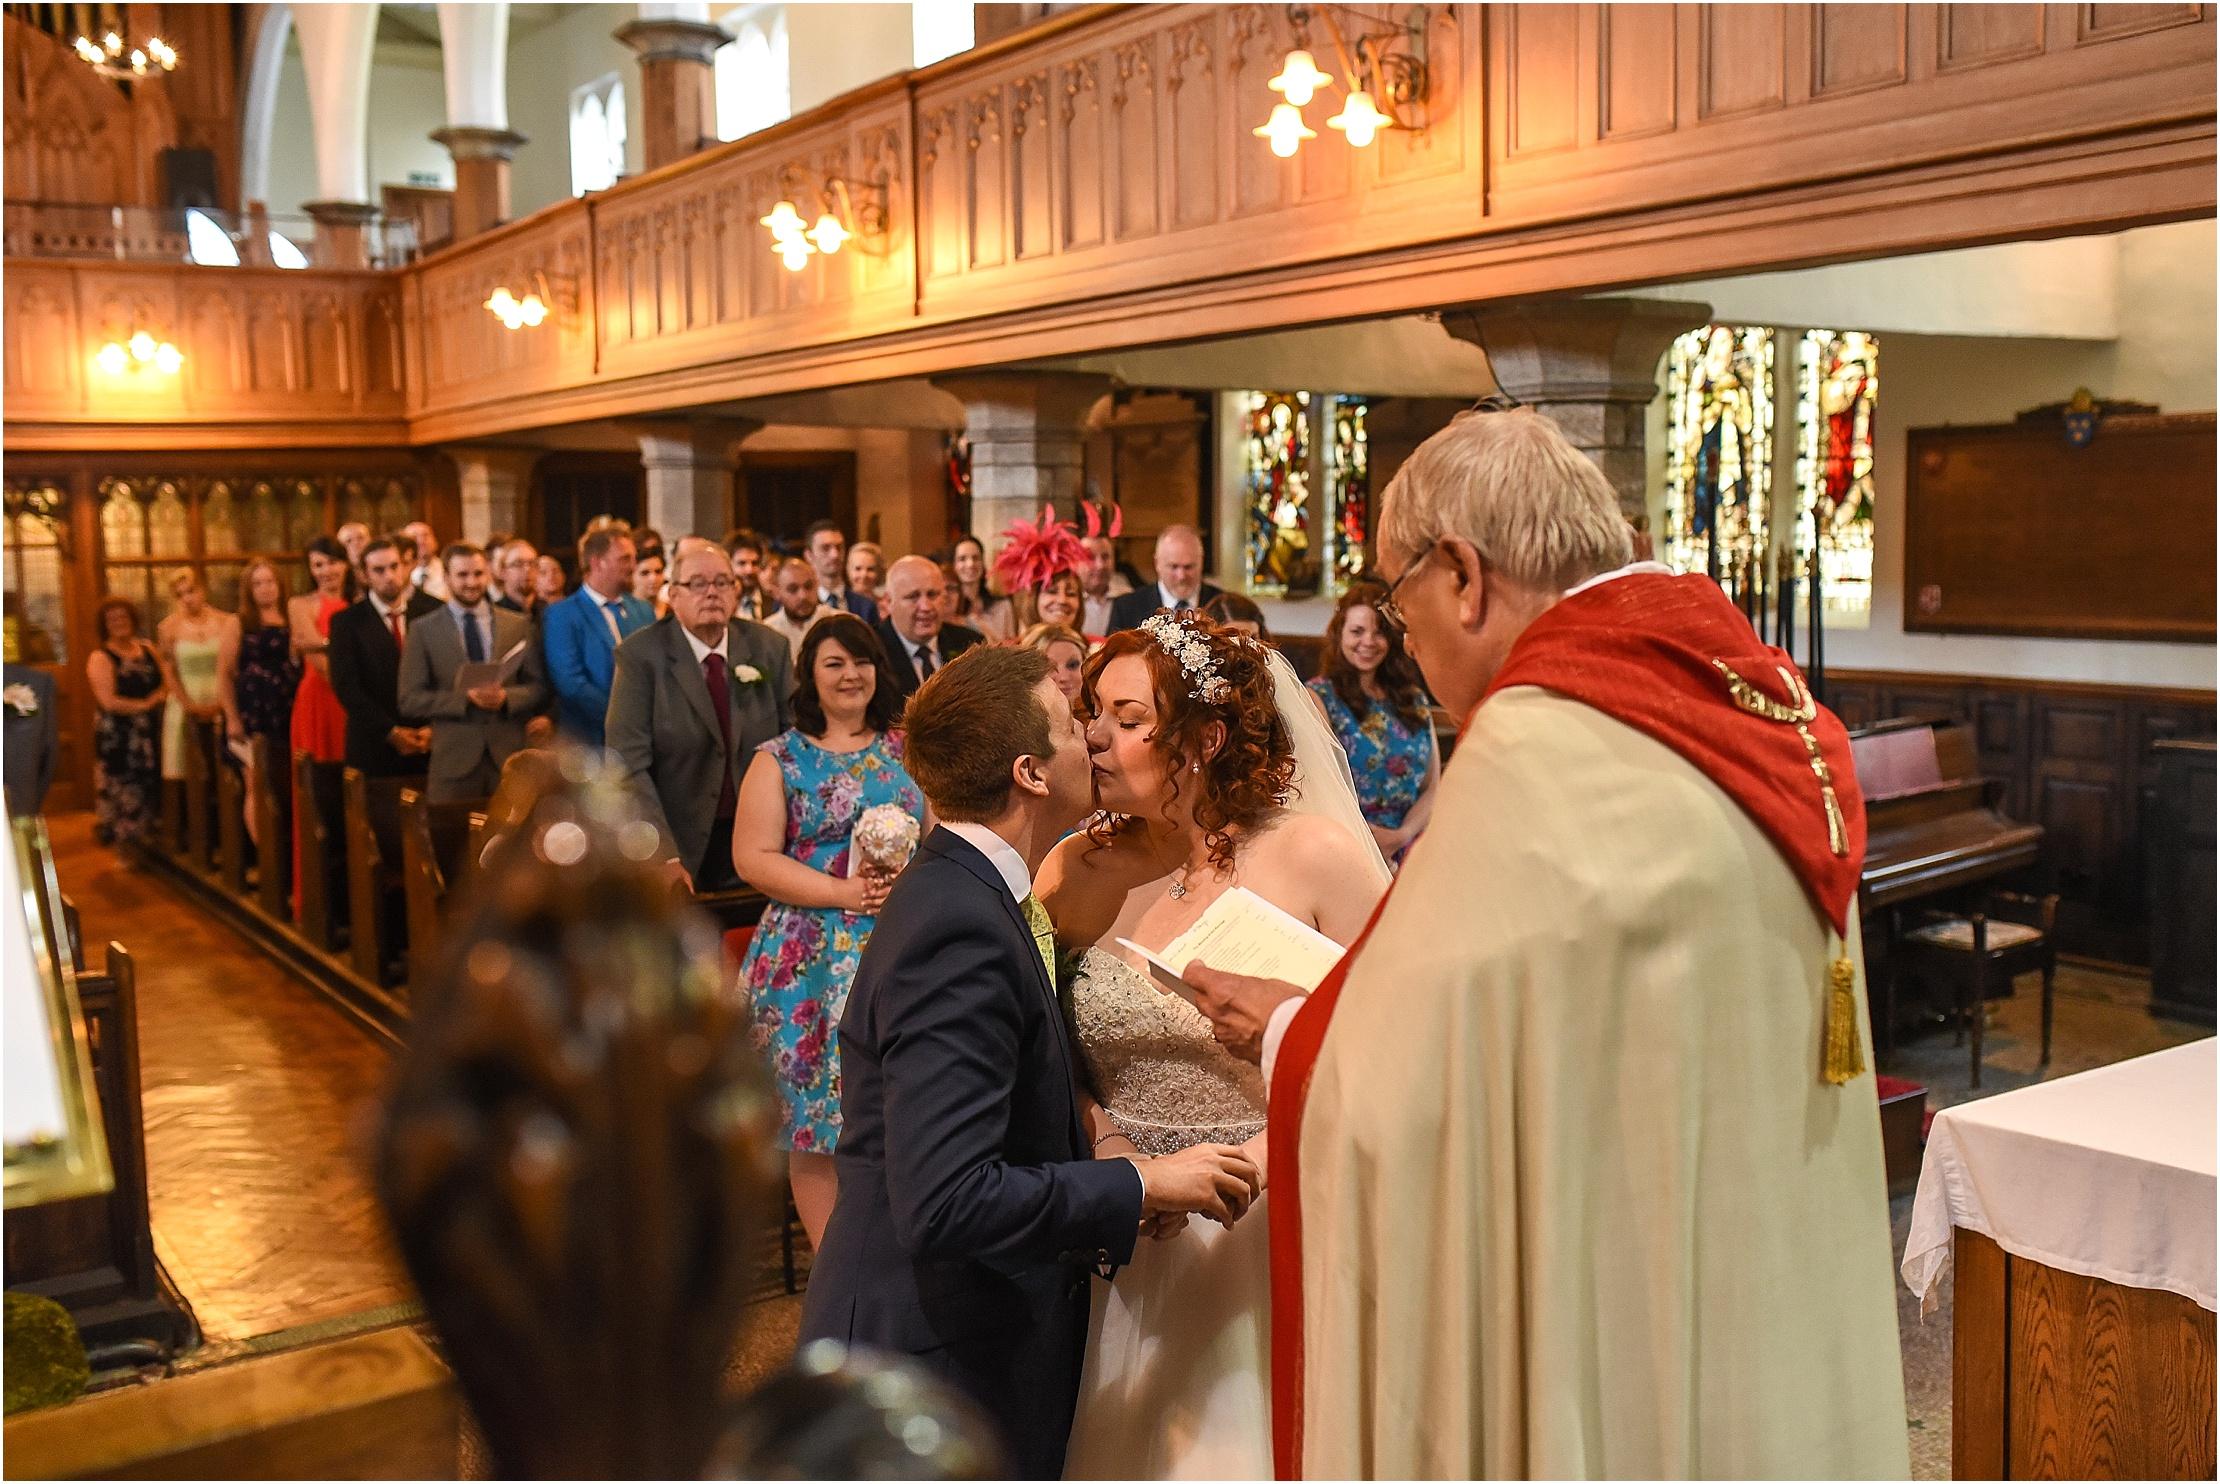 shireburn-arms-wedding- 058.jpg